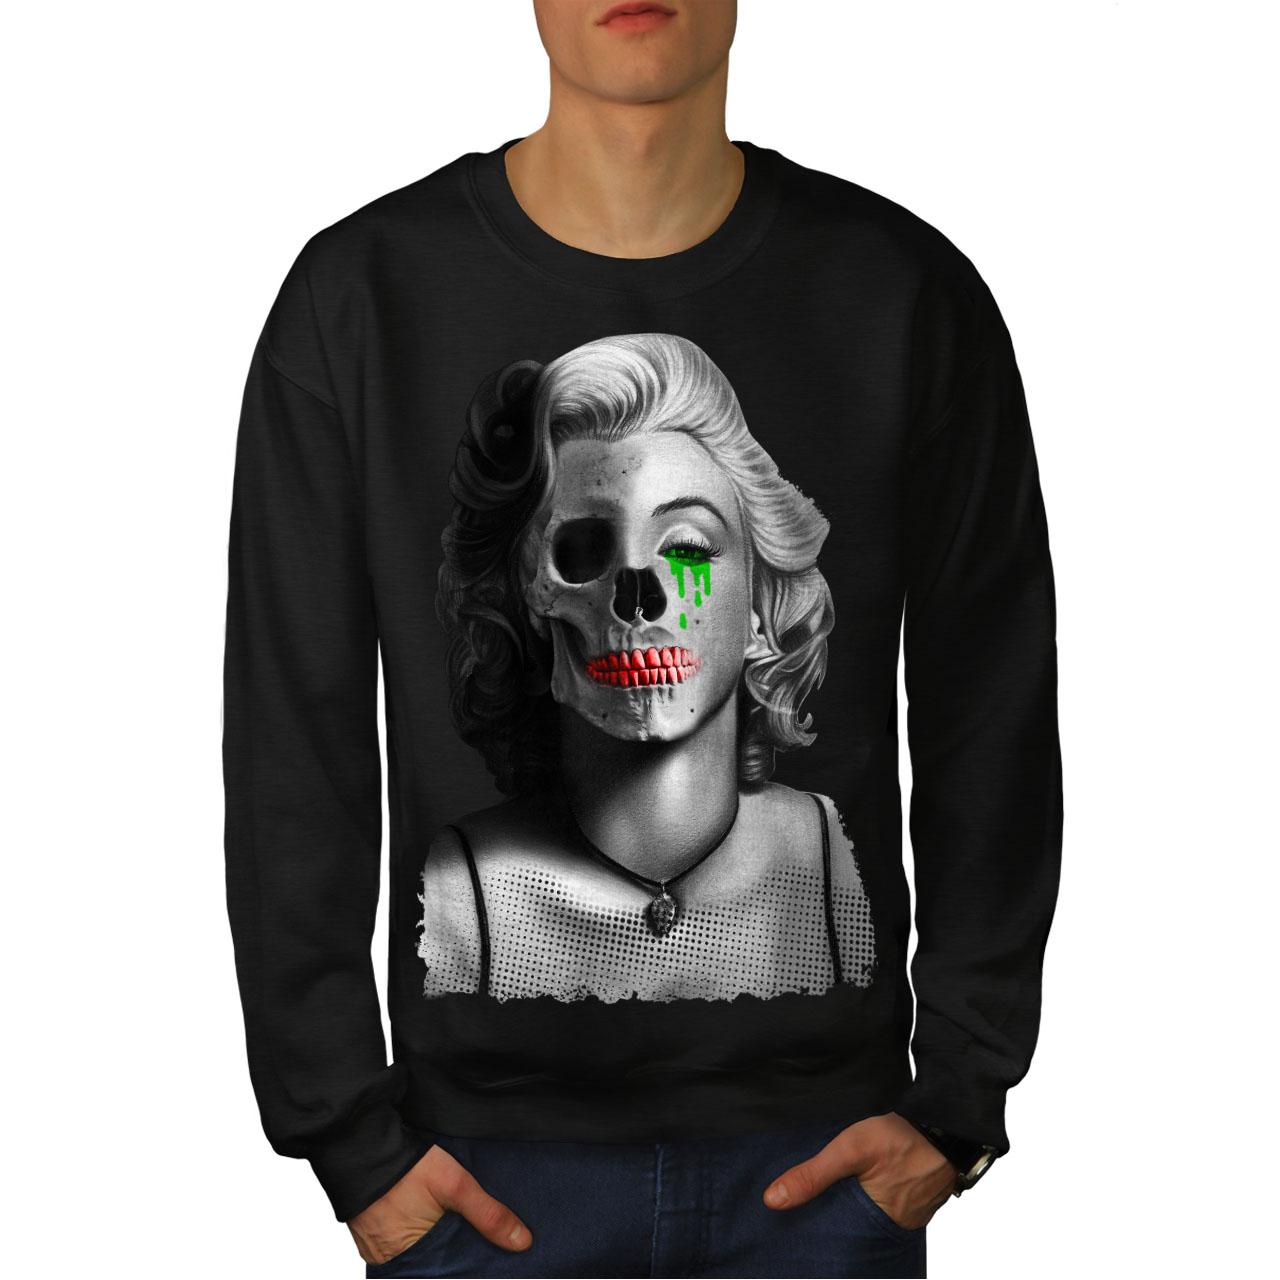 Paint Casual Pullover Jumper Wellcoda Skull Celebrity Mens Sweatshirt